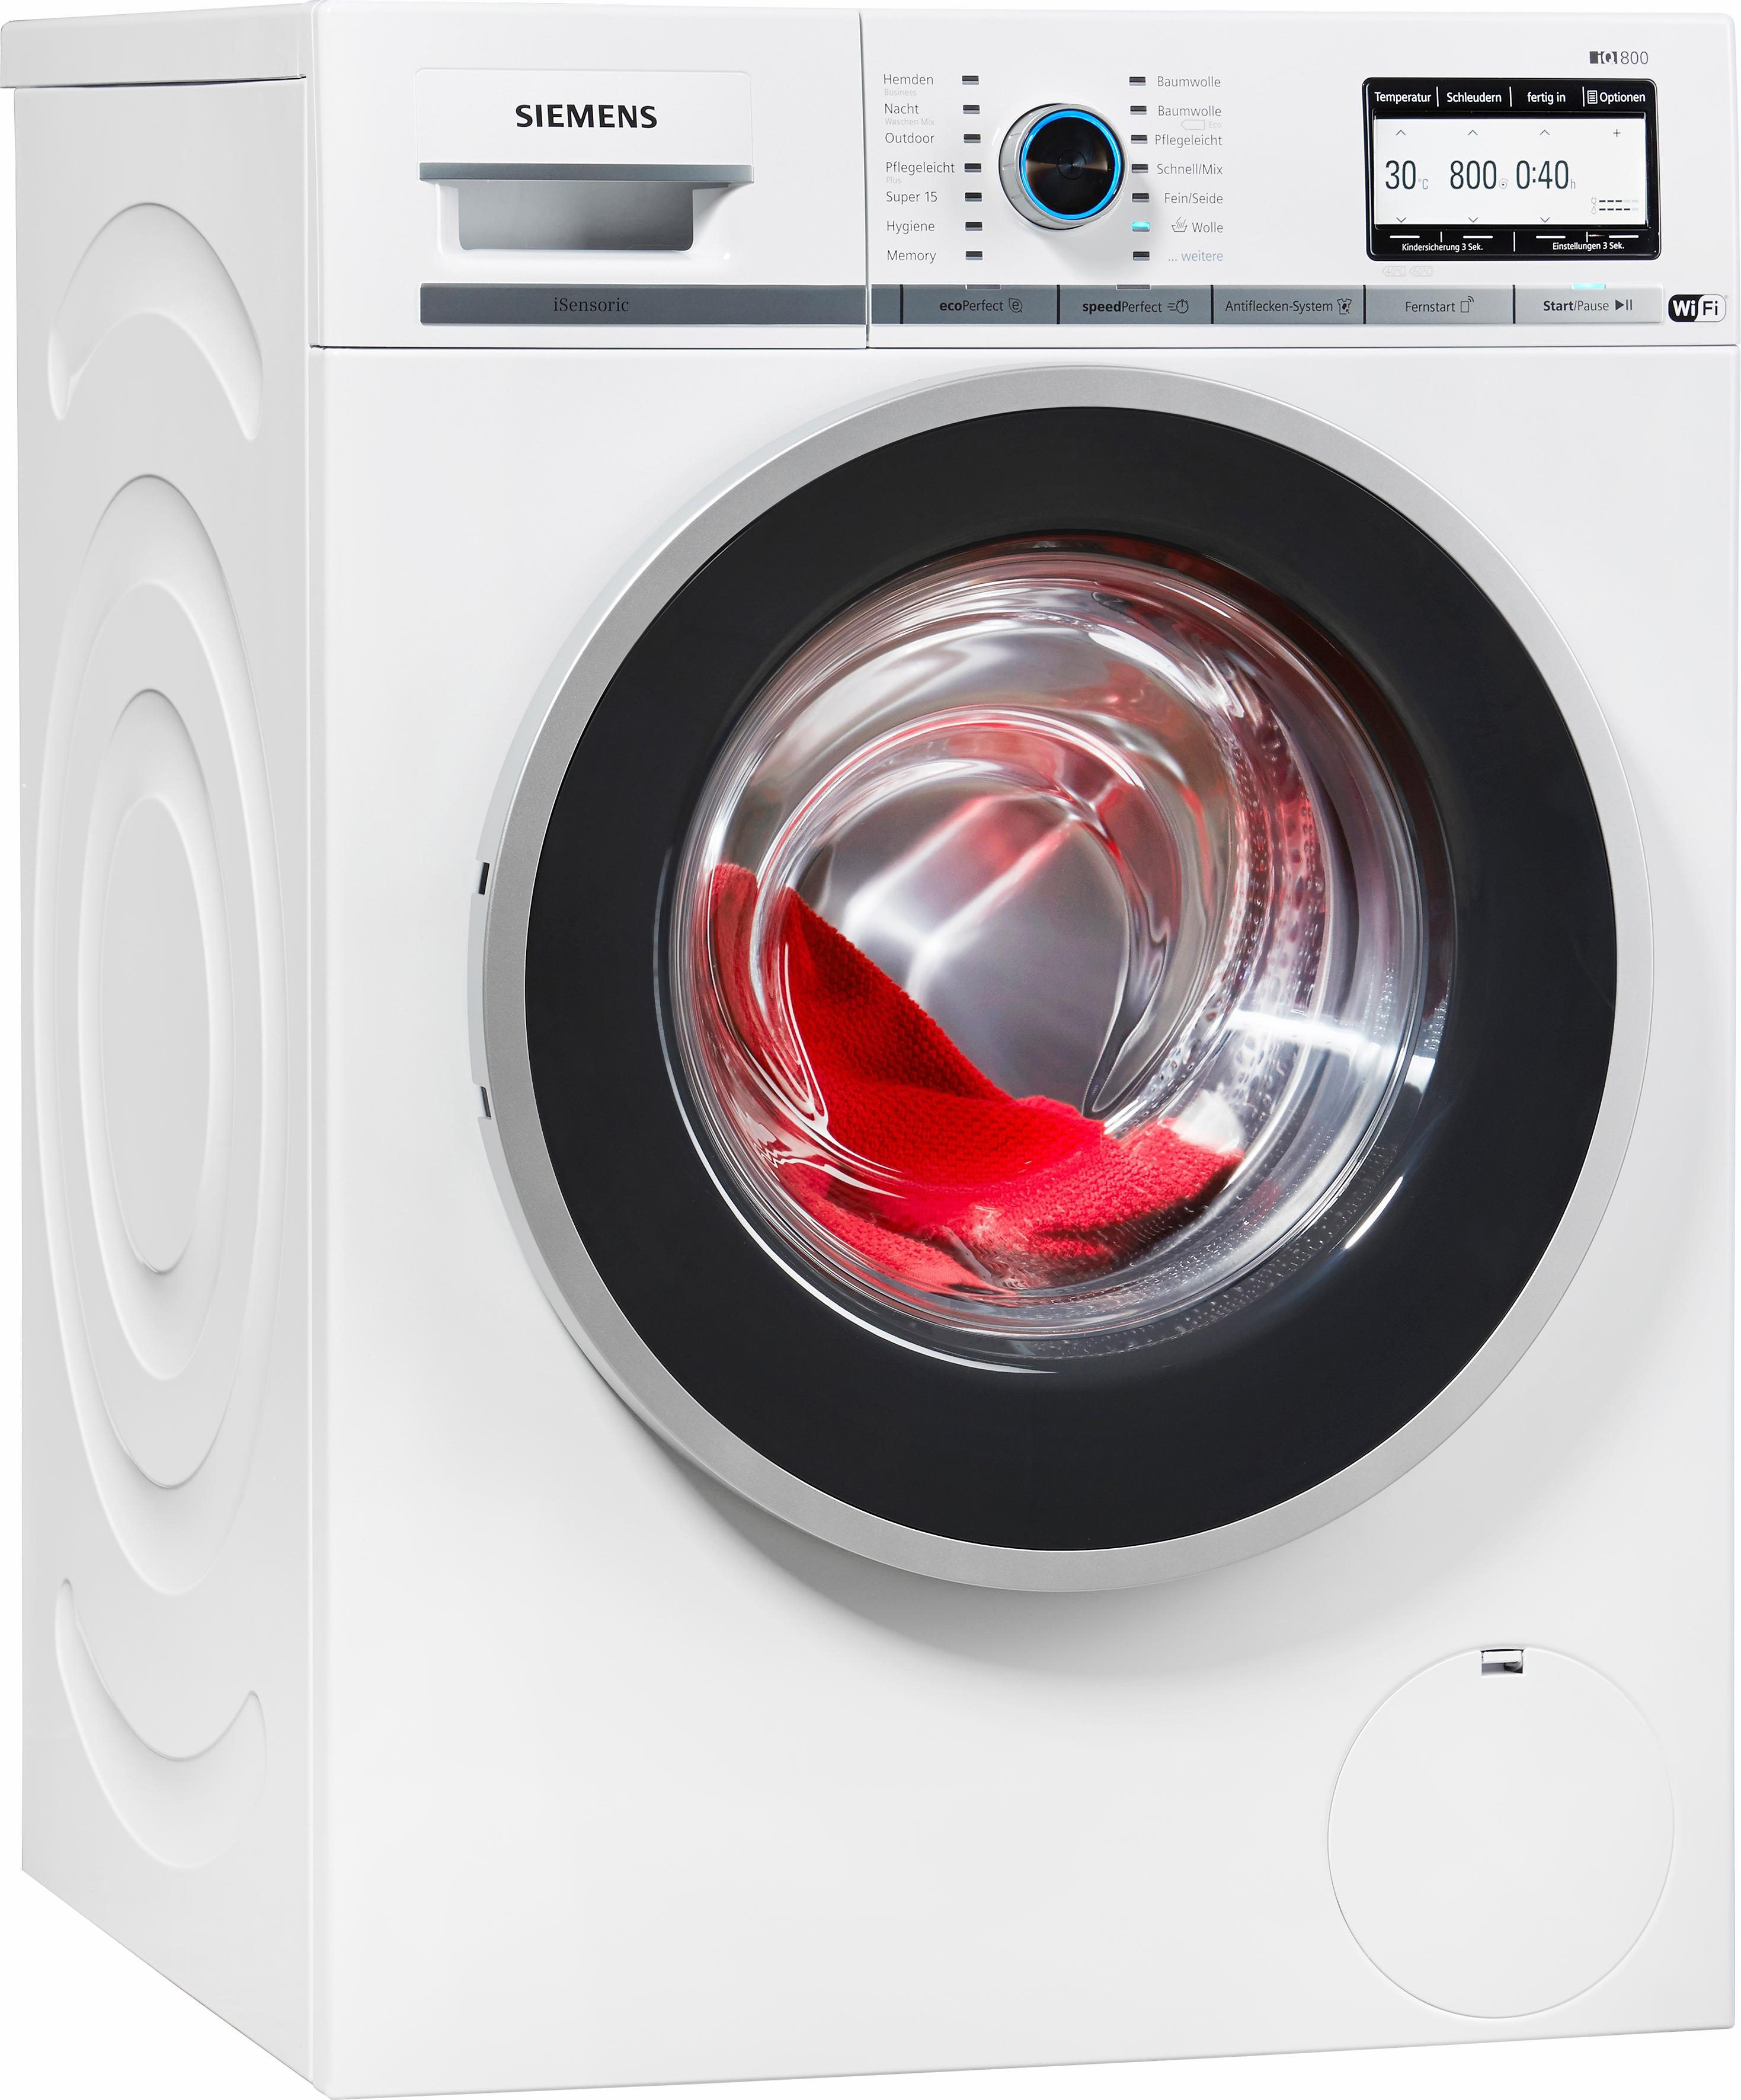 SIEMENS Waschmaschine WM6YH740, A+++, 8 kg, 1600 U/Min